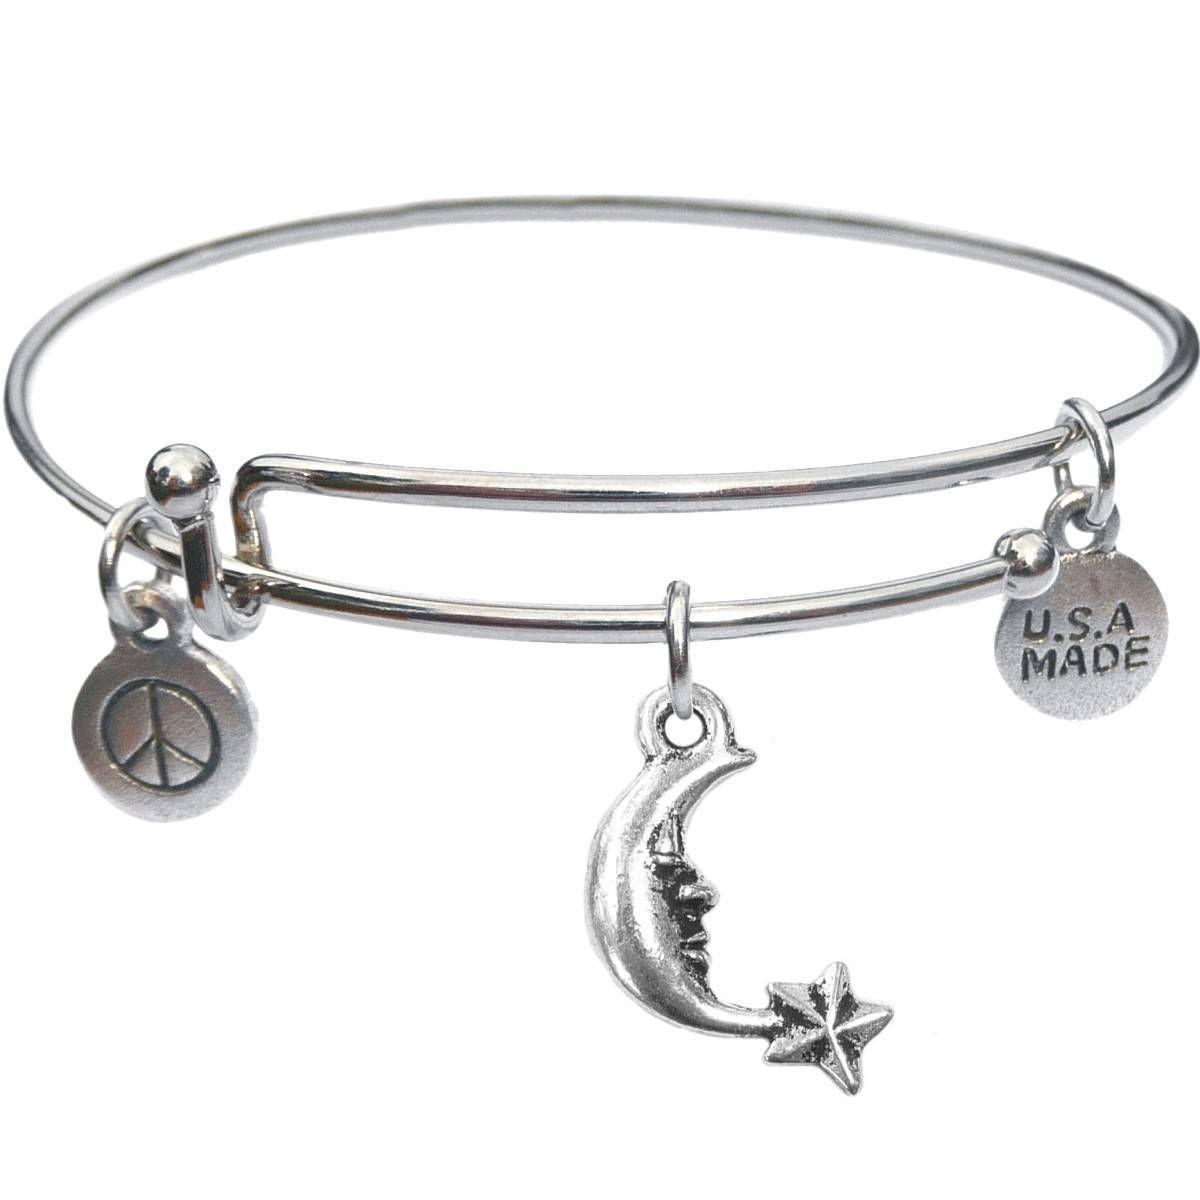 Bangle Bracelet and Moon And Star - USA Made - BBandJT124